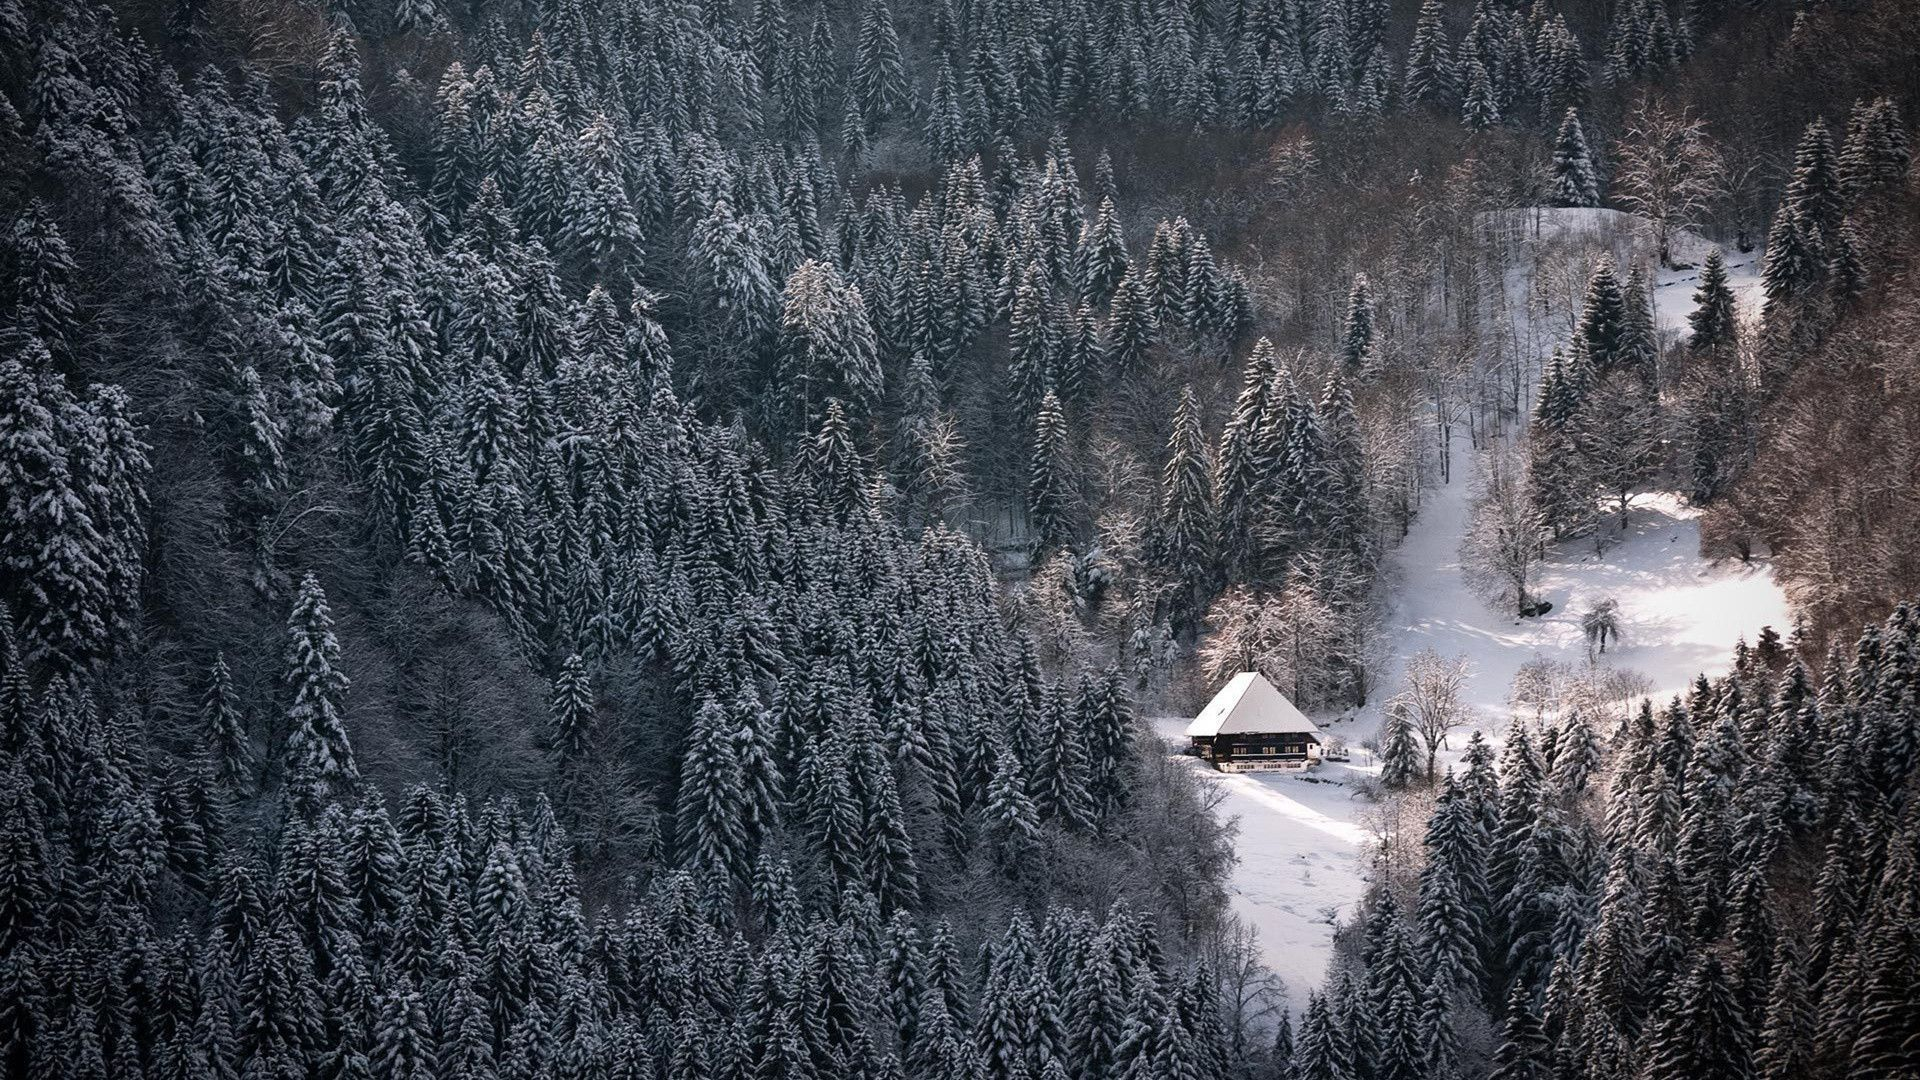 Winter Forest Hd Wallpaper